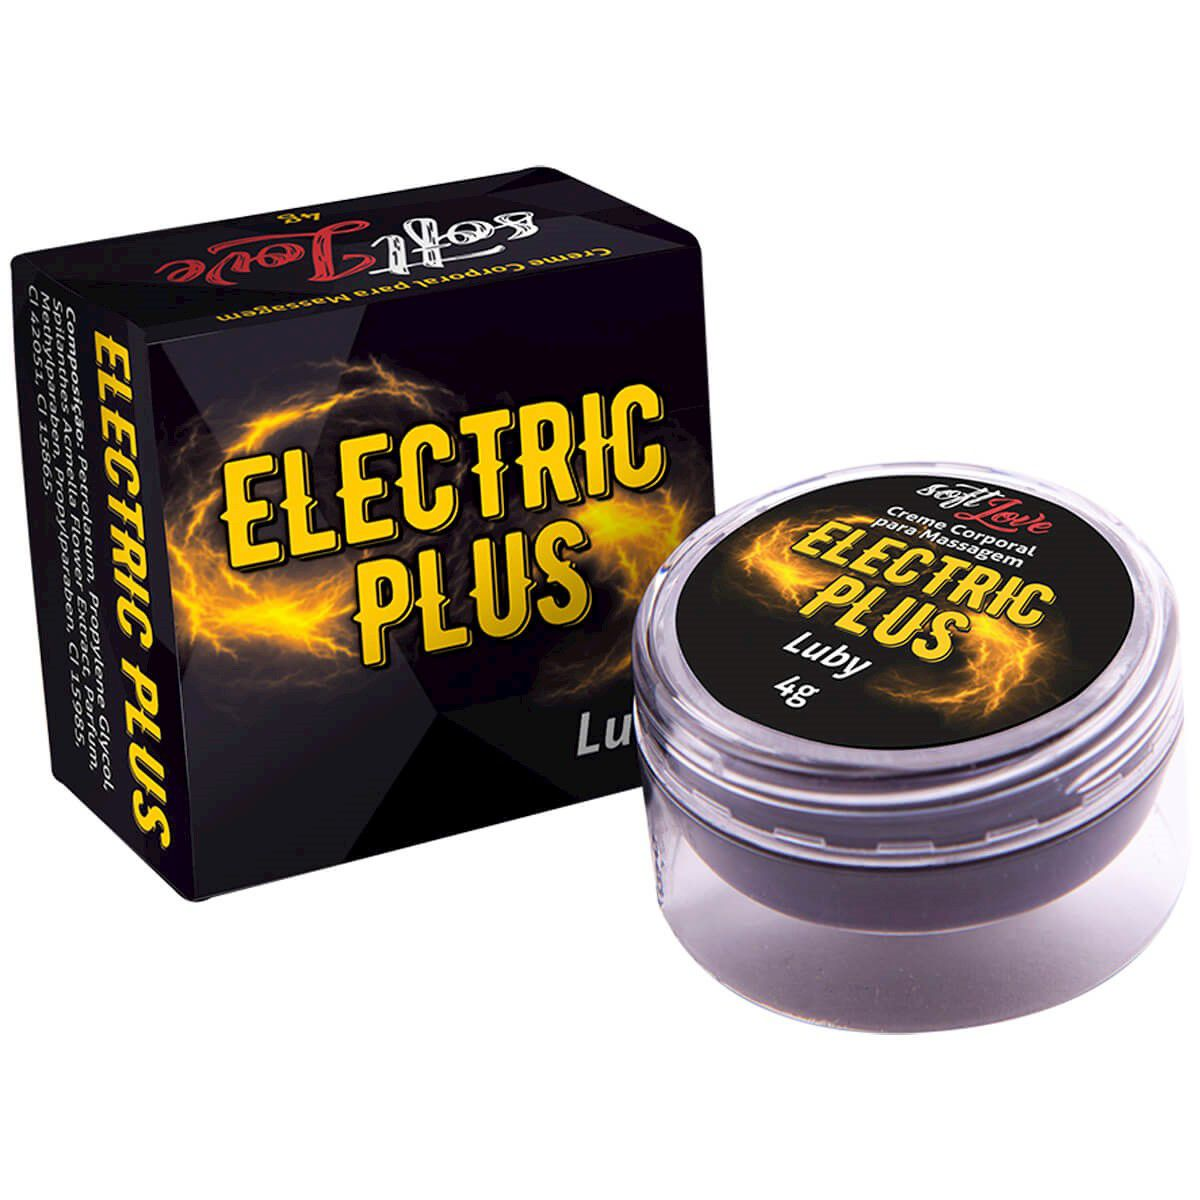 Pomada Eletric Plus Luby 4G - Soft Love